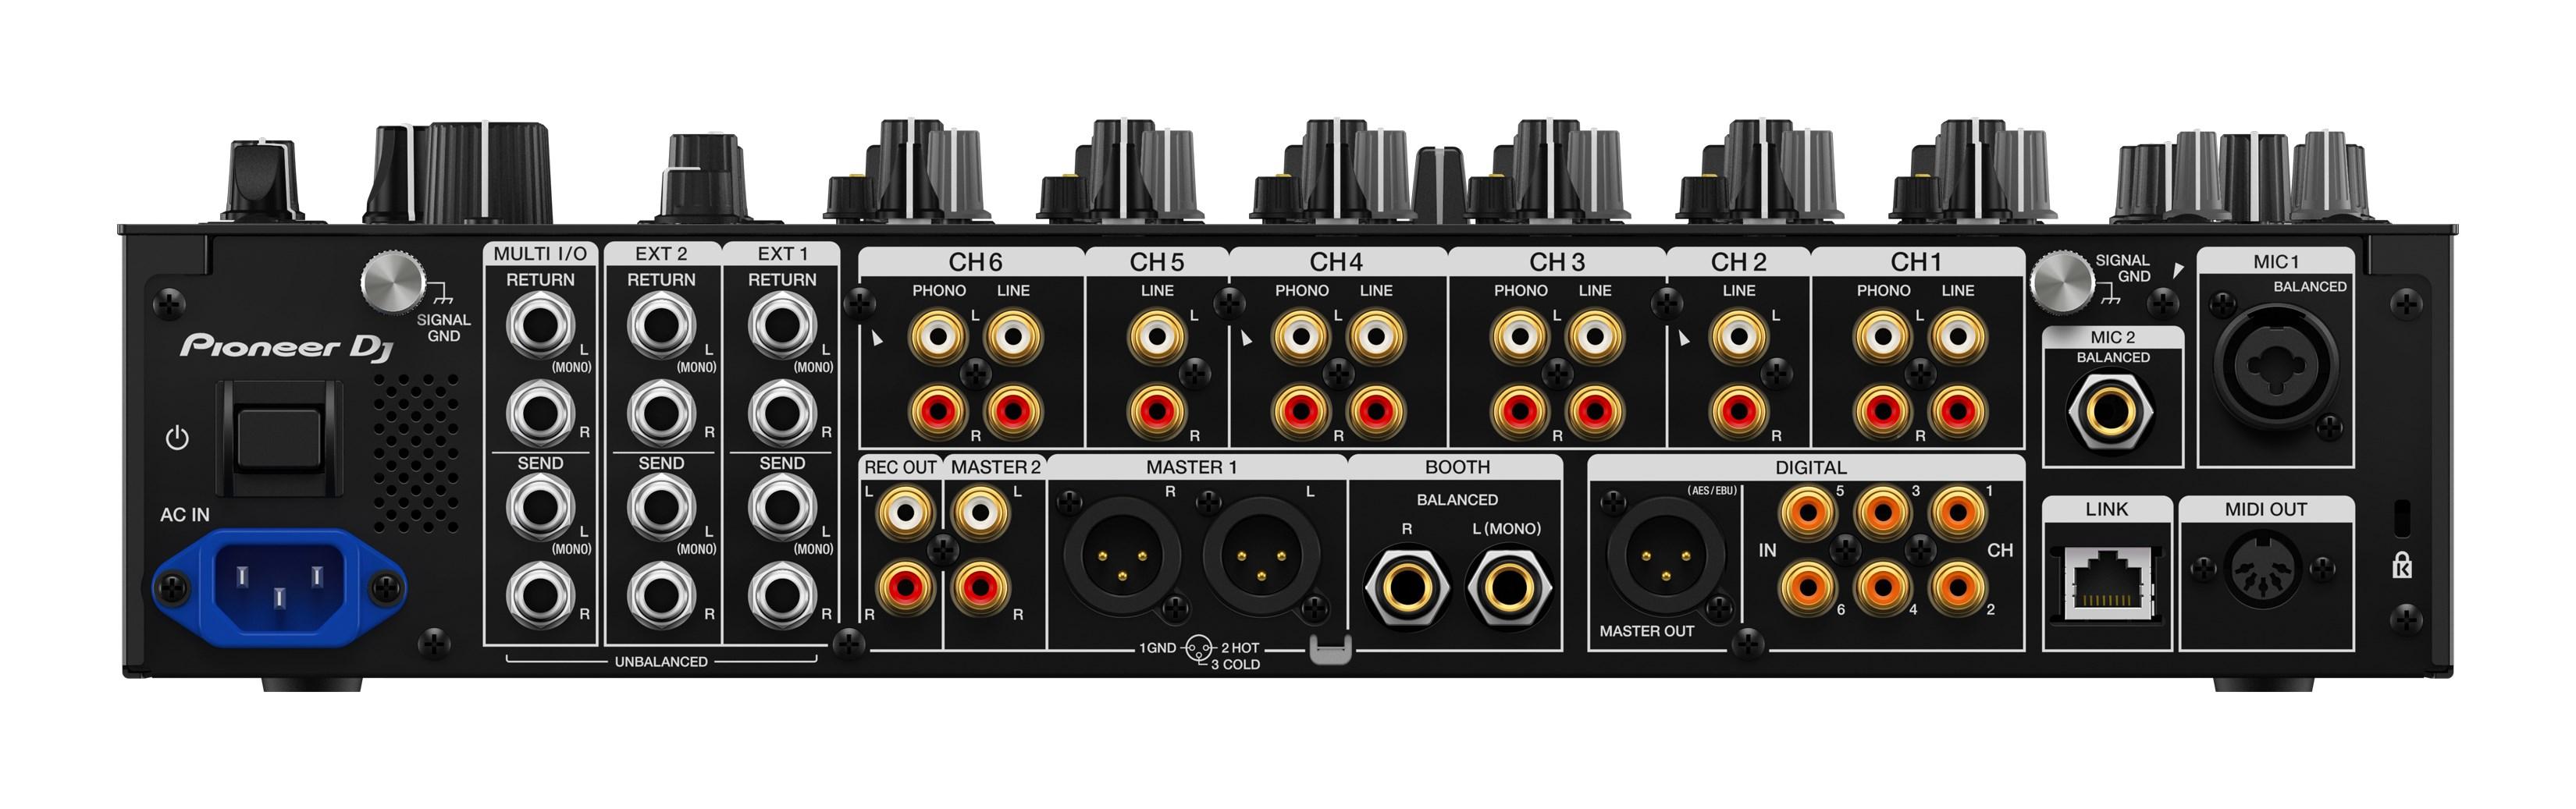 djm-v10-rear - CDM Create Digital Music